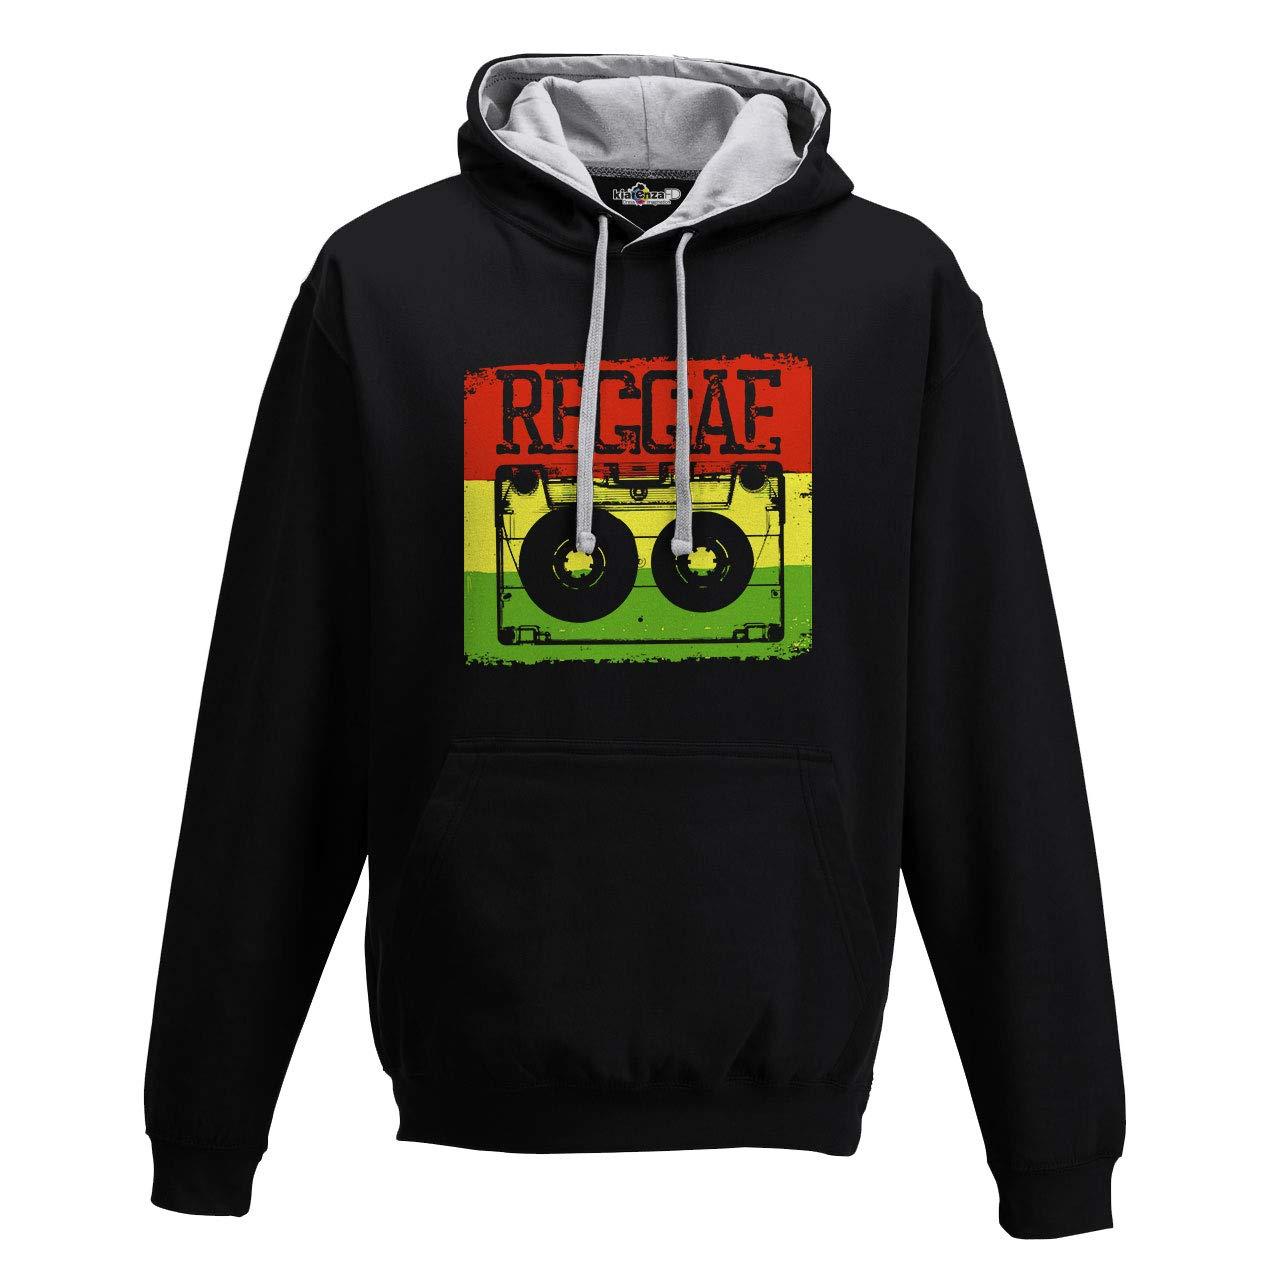 KiarenzaFD Hoodie Bico Music Reggae Peace and Love Jamaica Musicette 80s